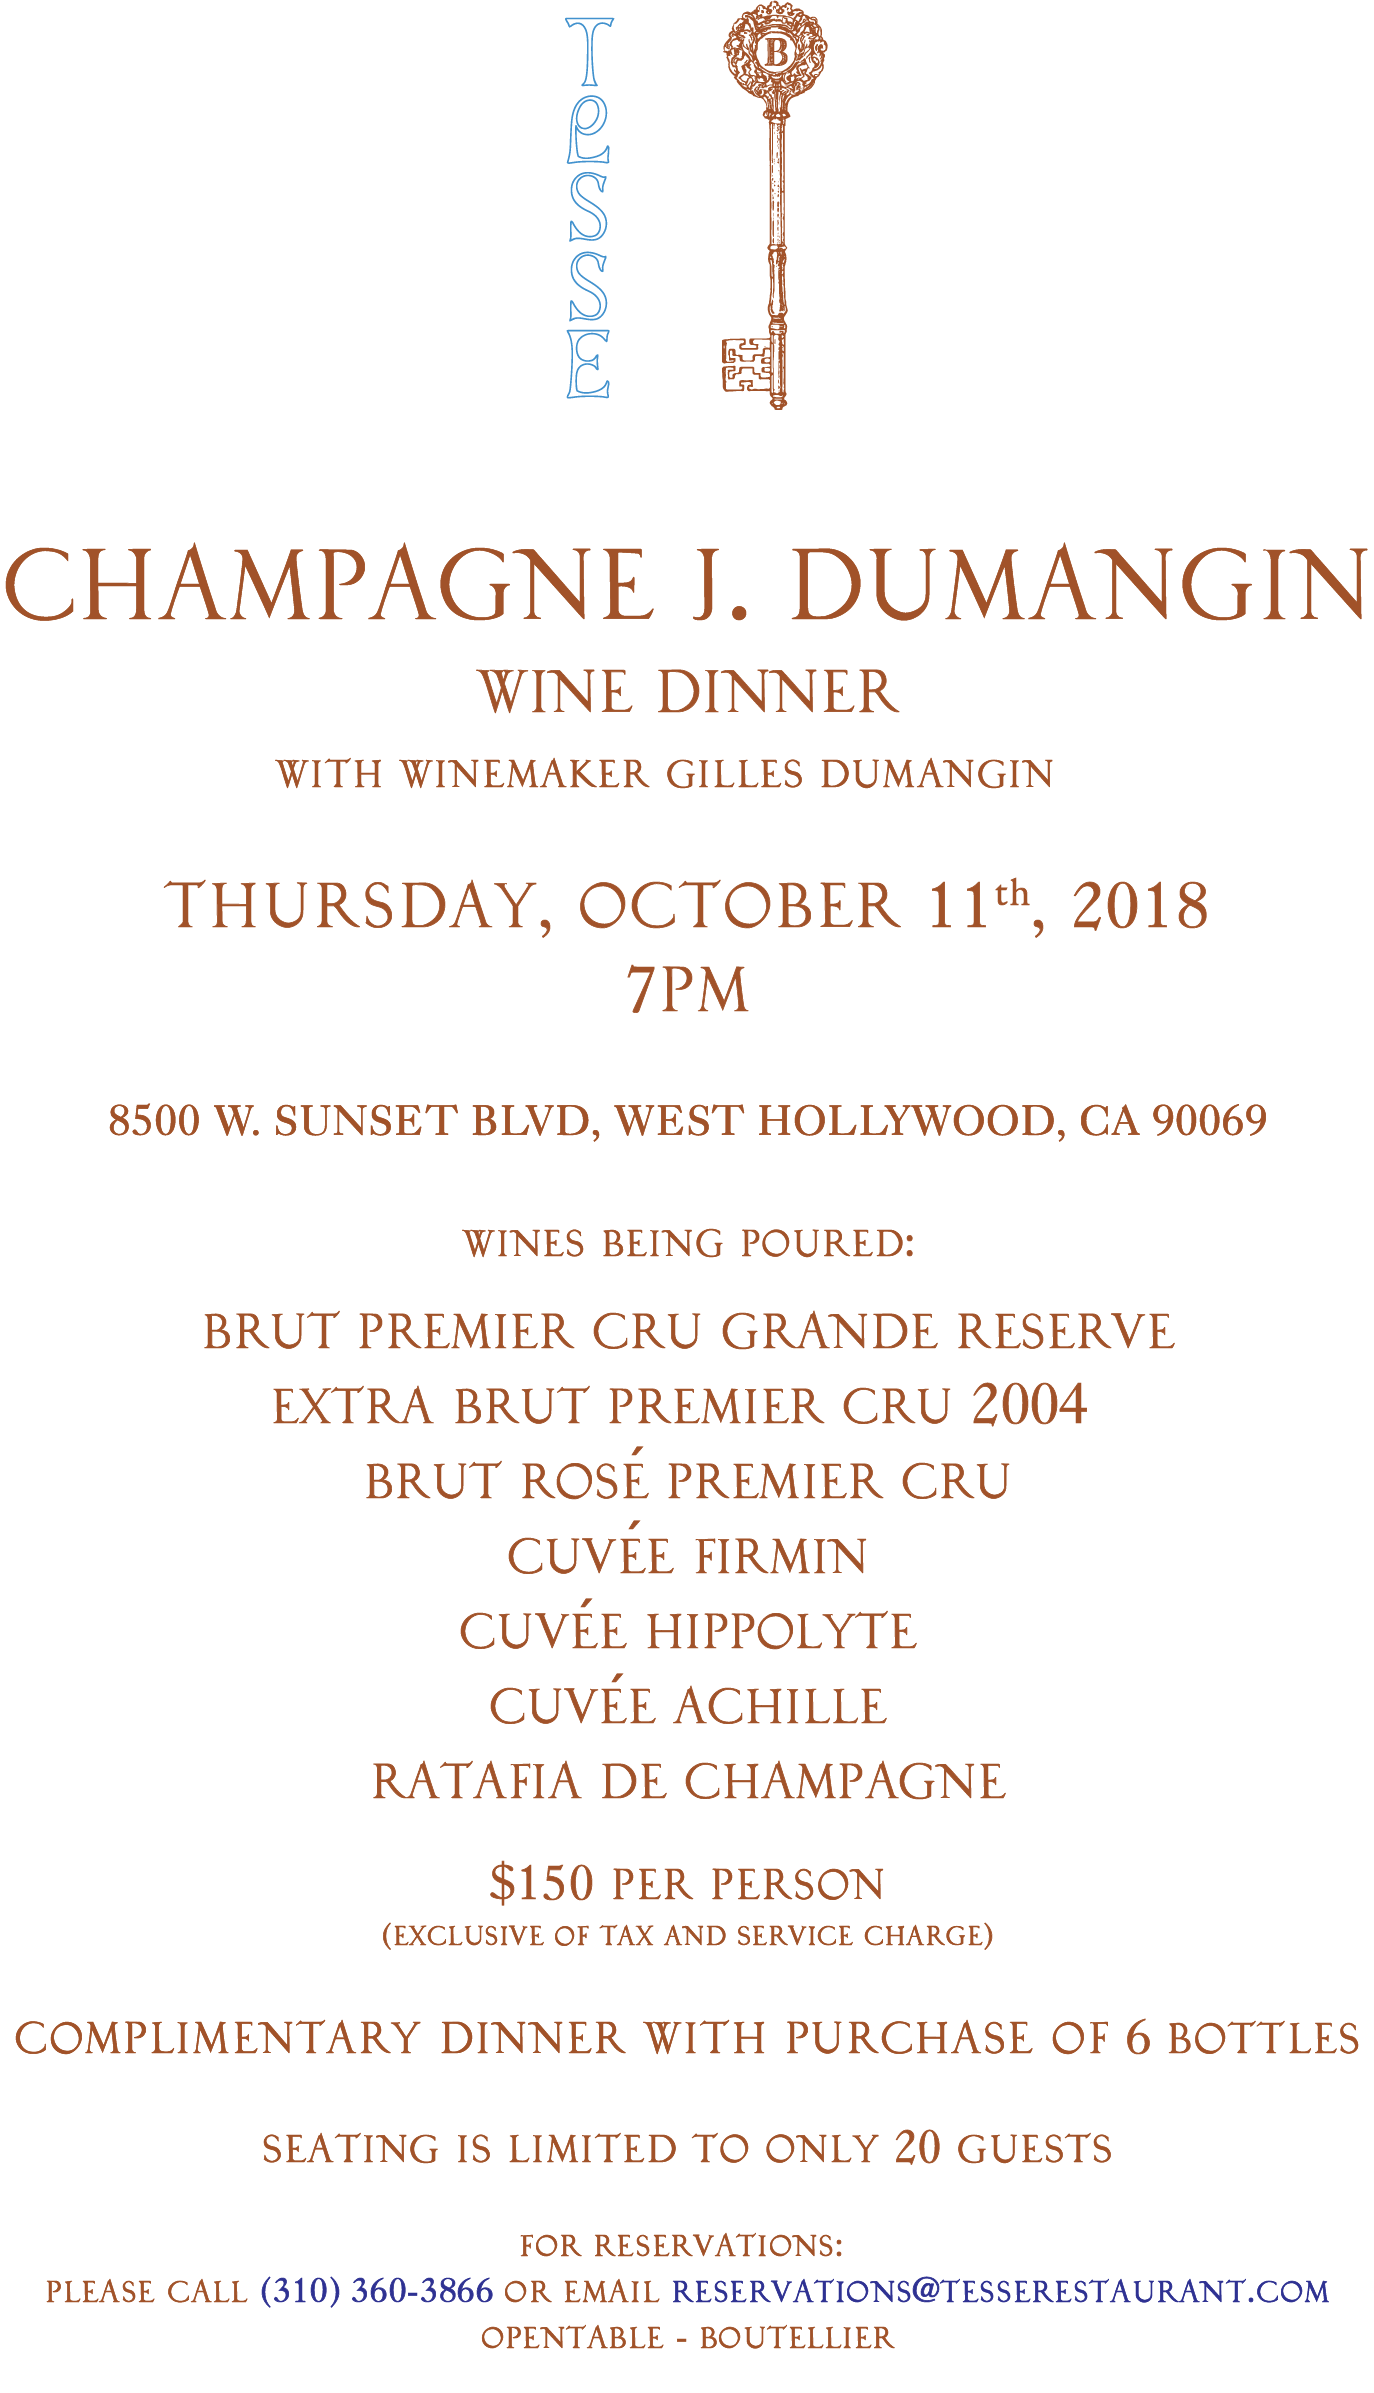 Champagne Dumangin Wine Dinner Invite.png